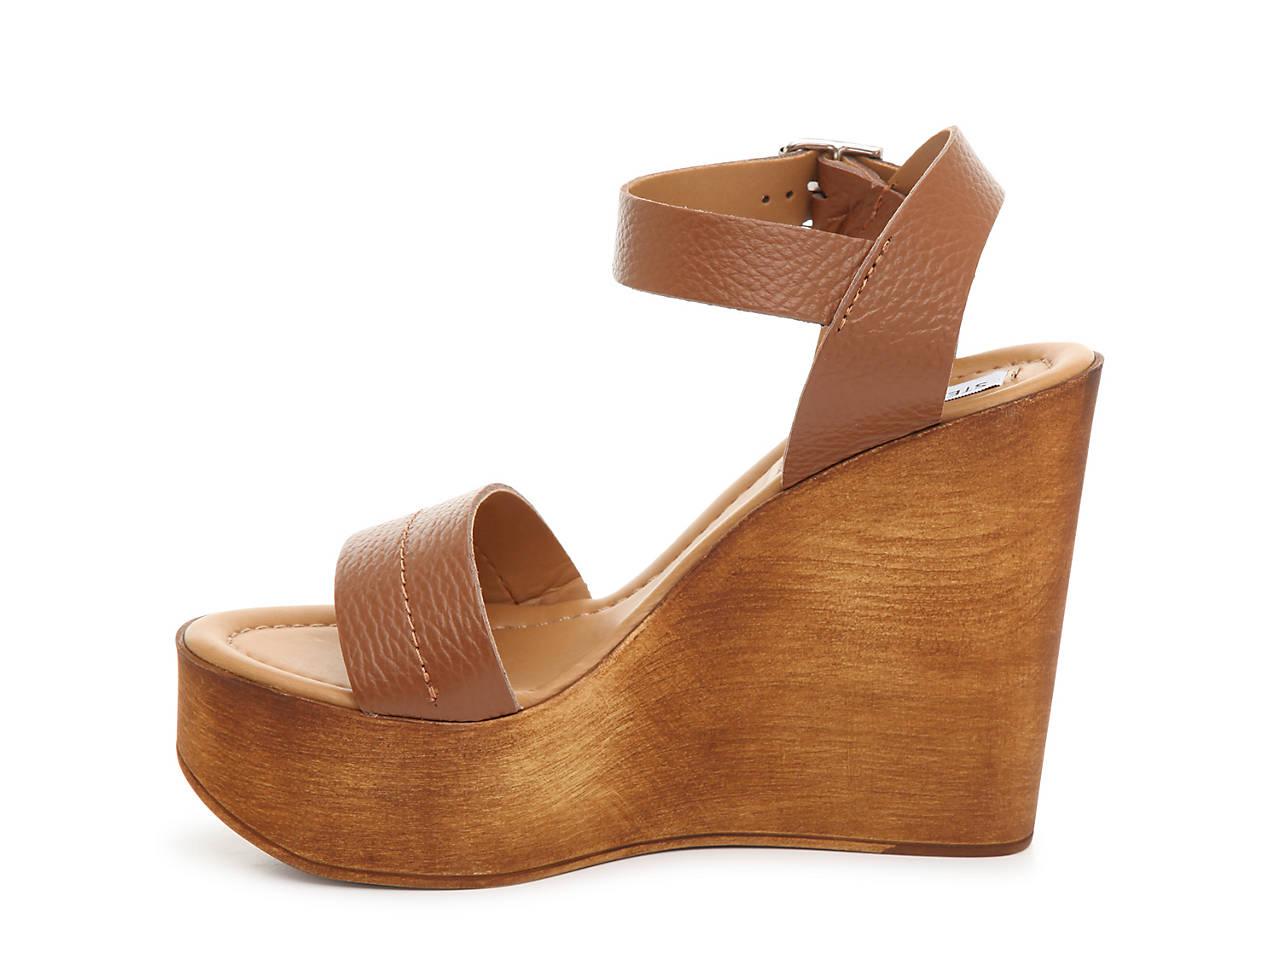 d558fb8fbfa Steve Madden Belma Wedge Sandal Women s Shoes